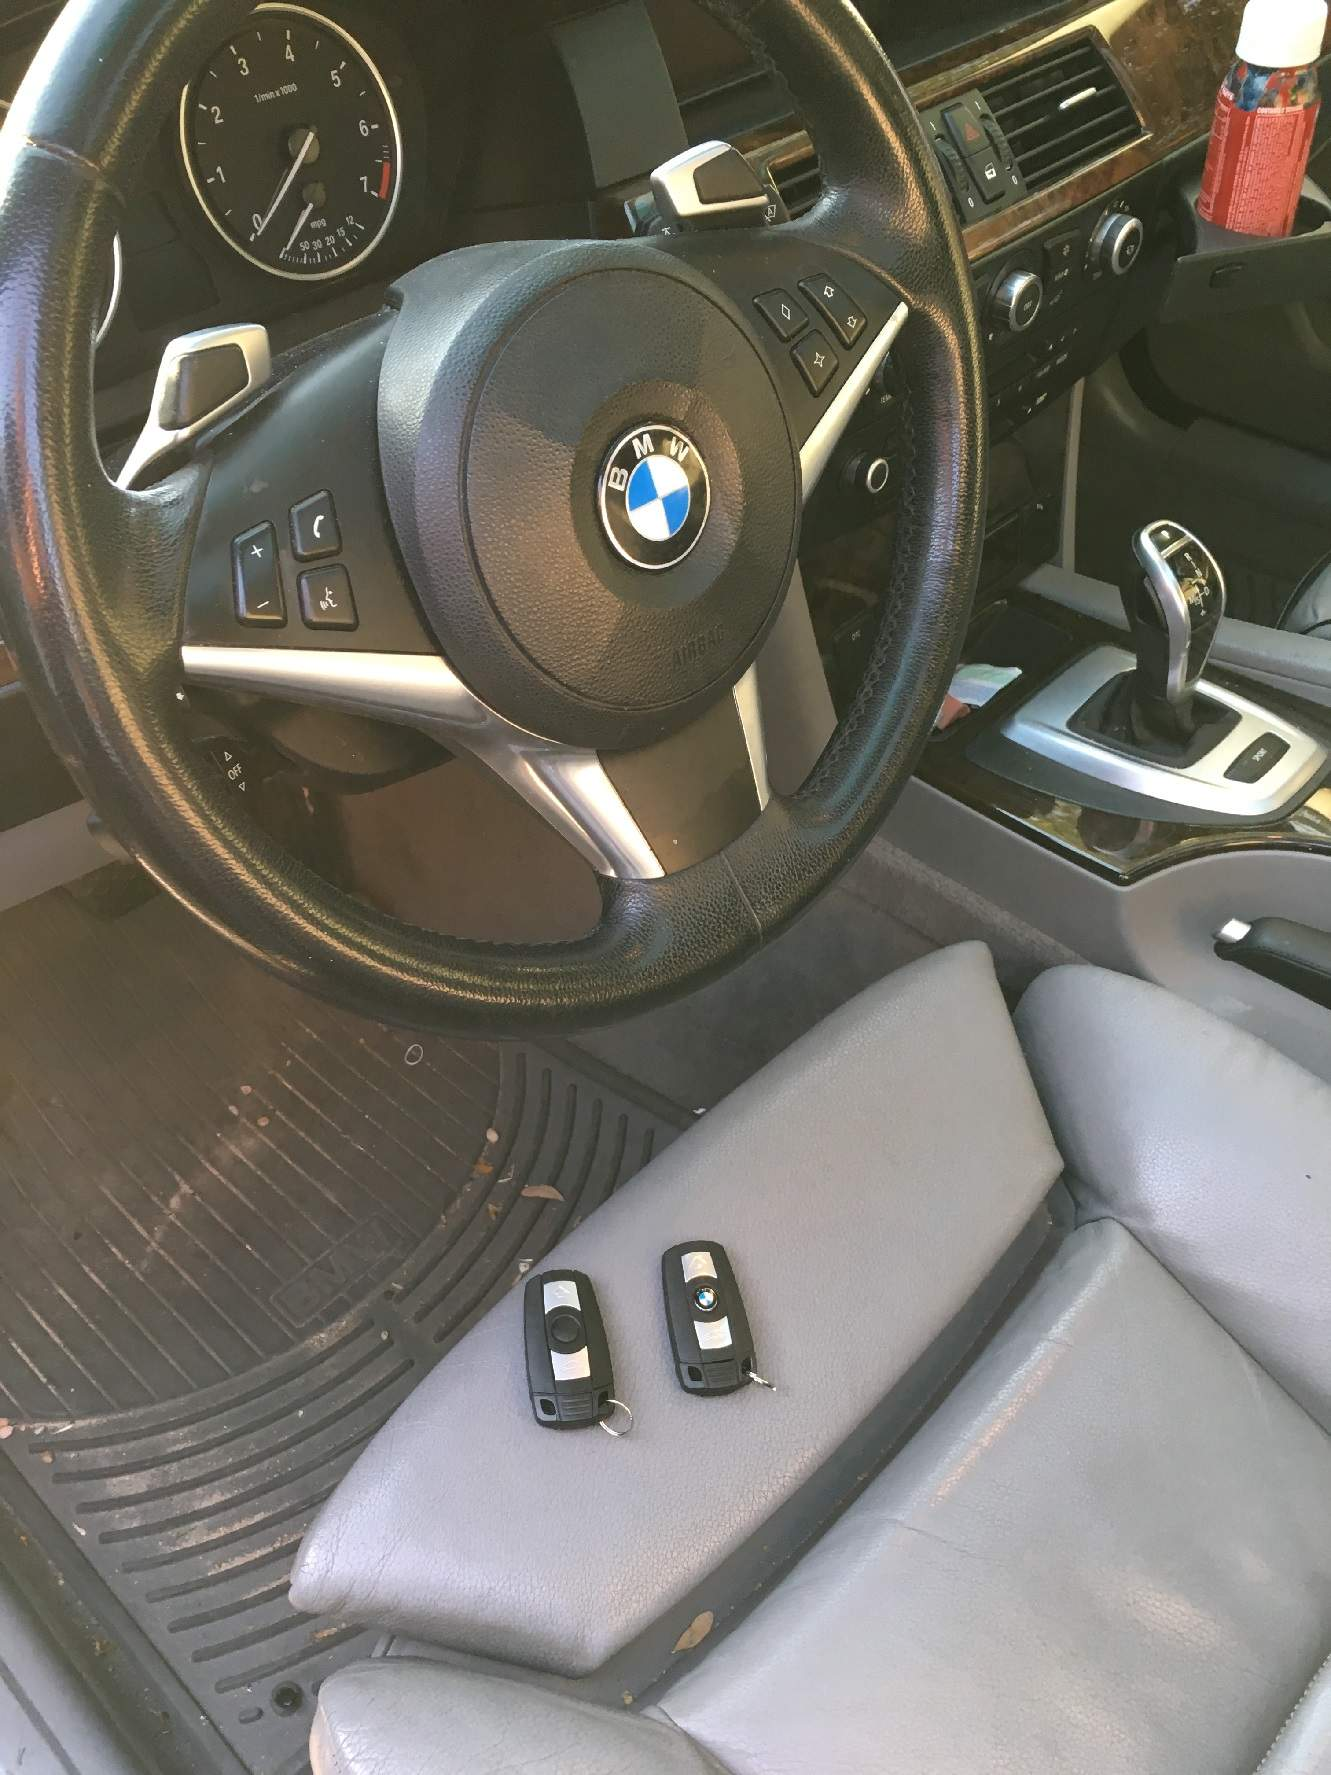 BMW Keys - Henry's lock and key